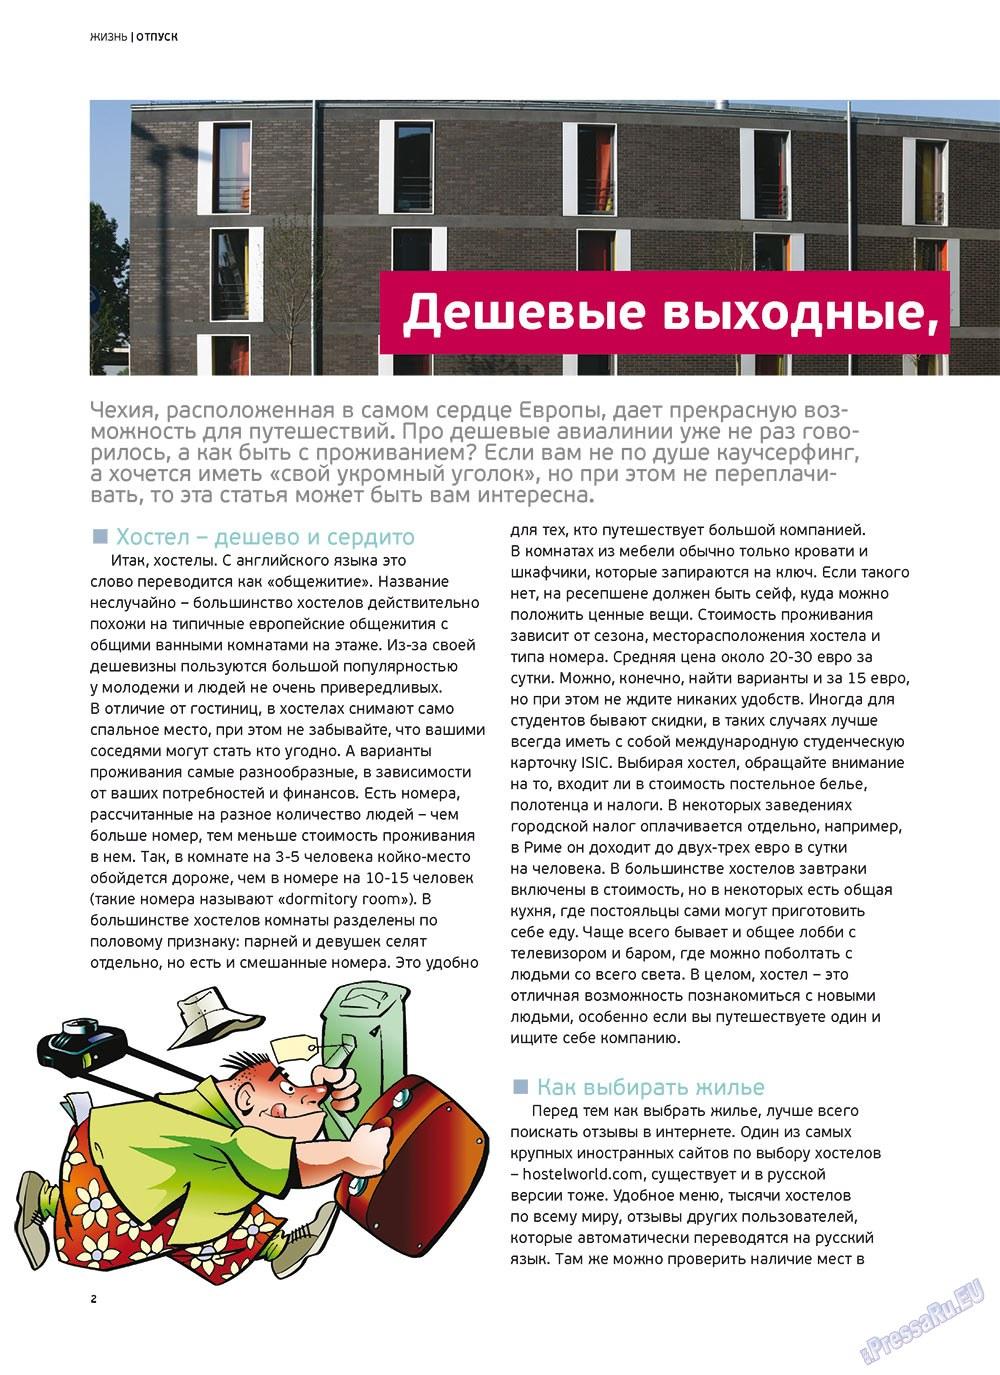 Артек (журнал). 2012 год, номер 2, стр. 4